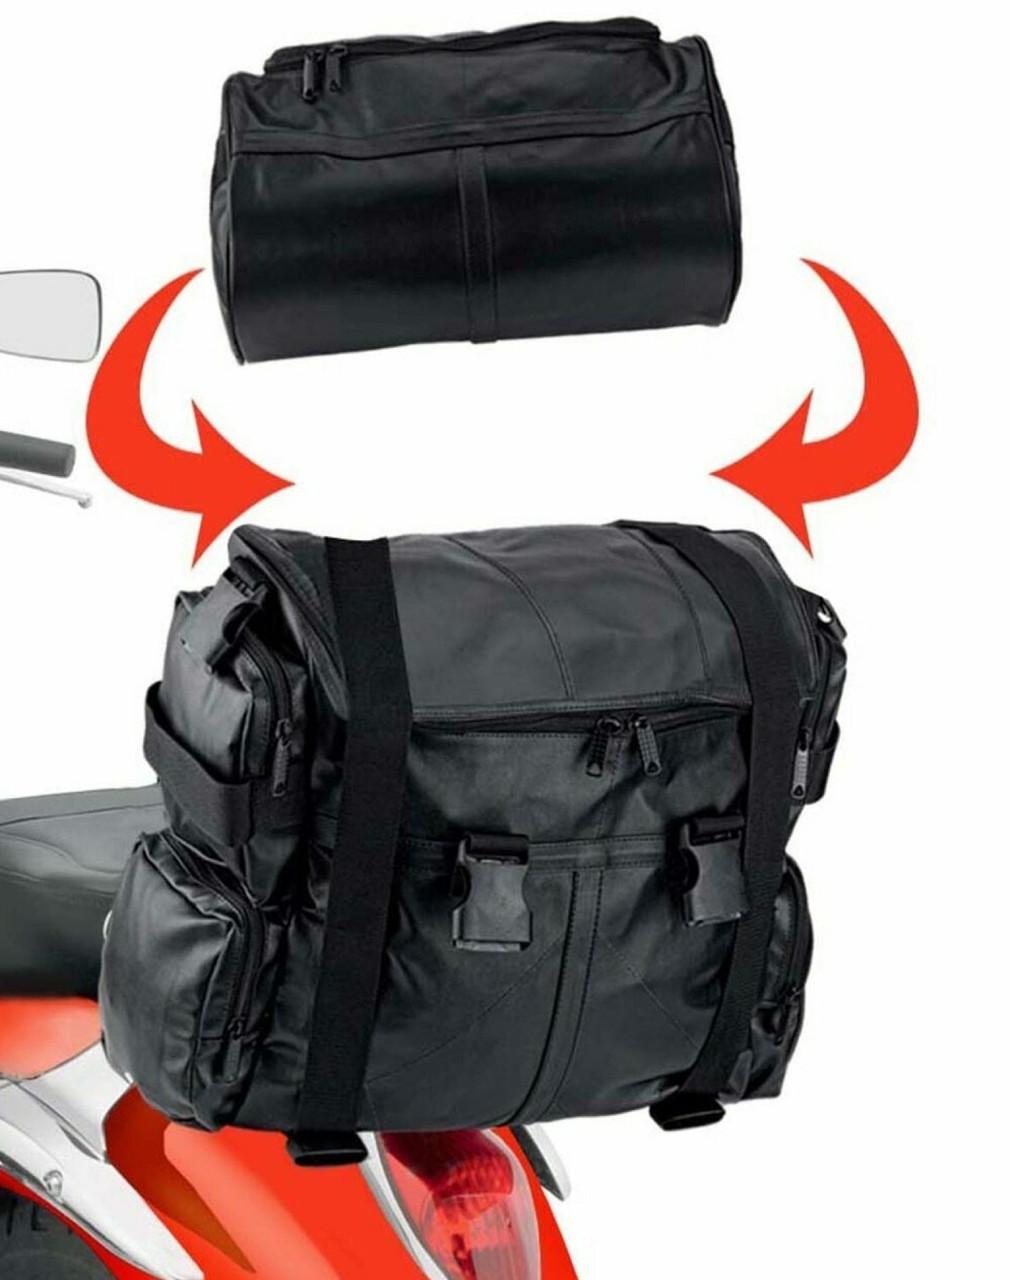 Suzuki Viking Aero Medium Expandable Motorcycle Sissy Bar Bags with Roll Bag